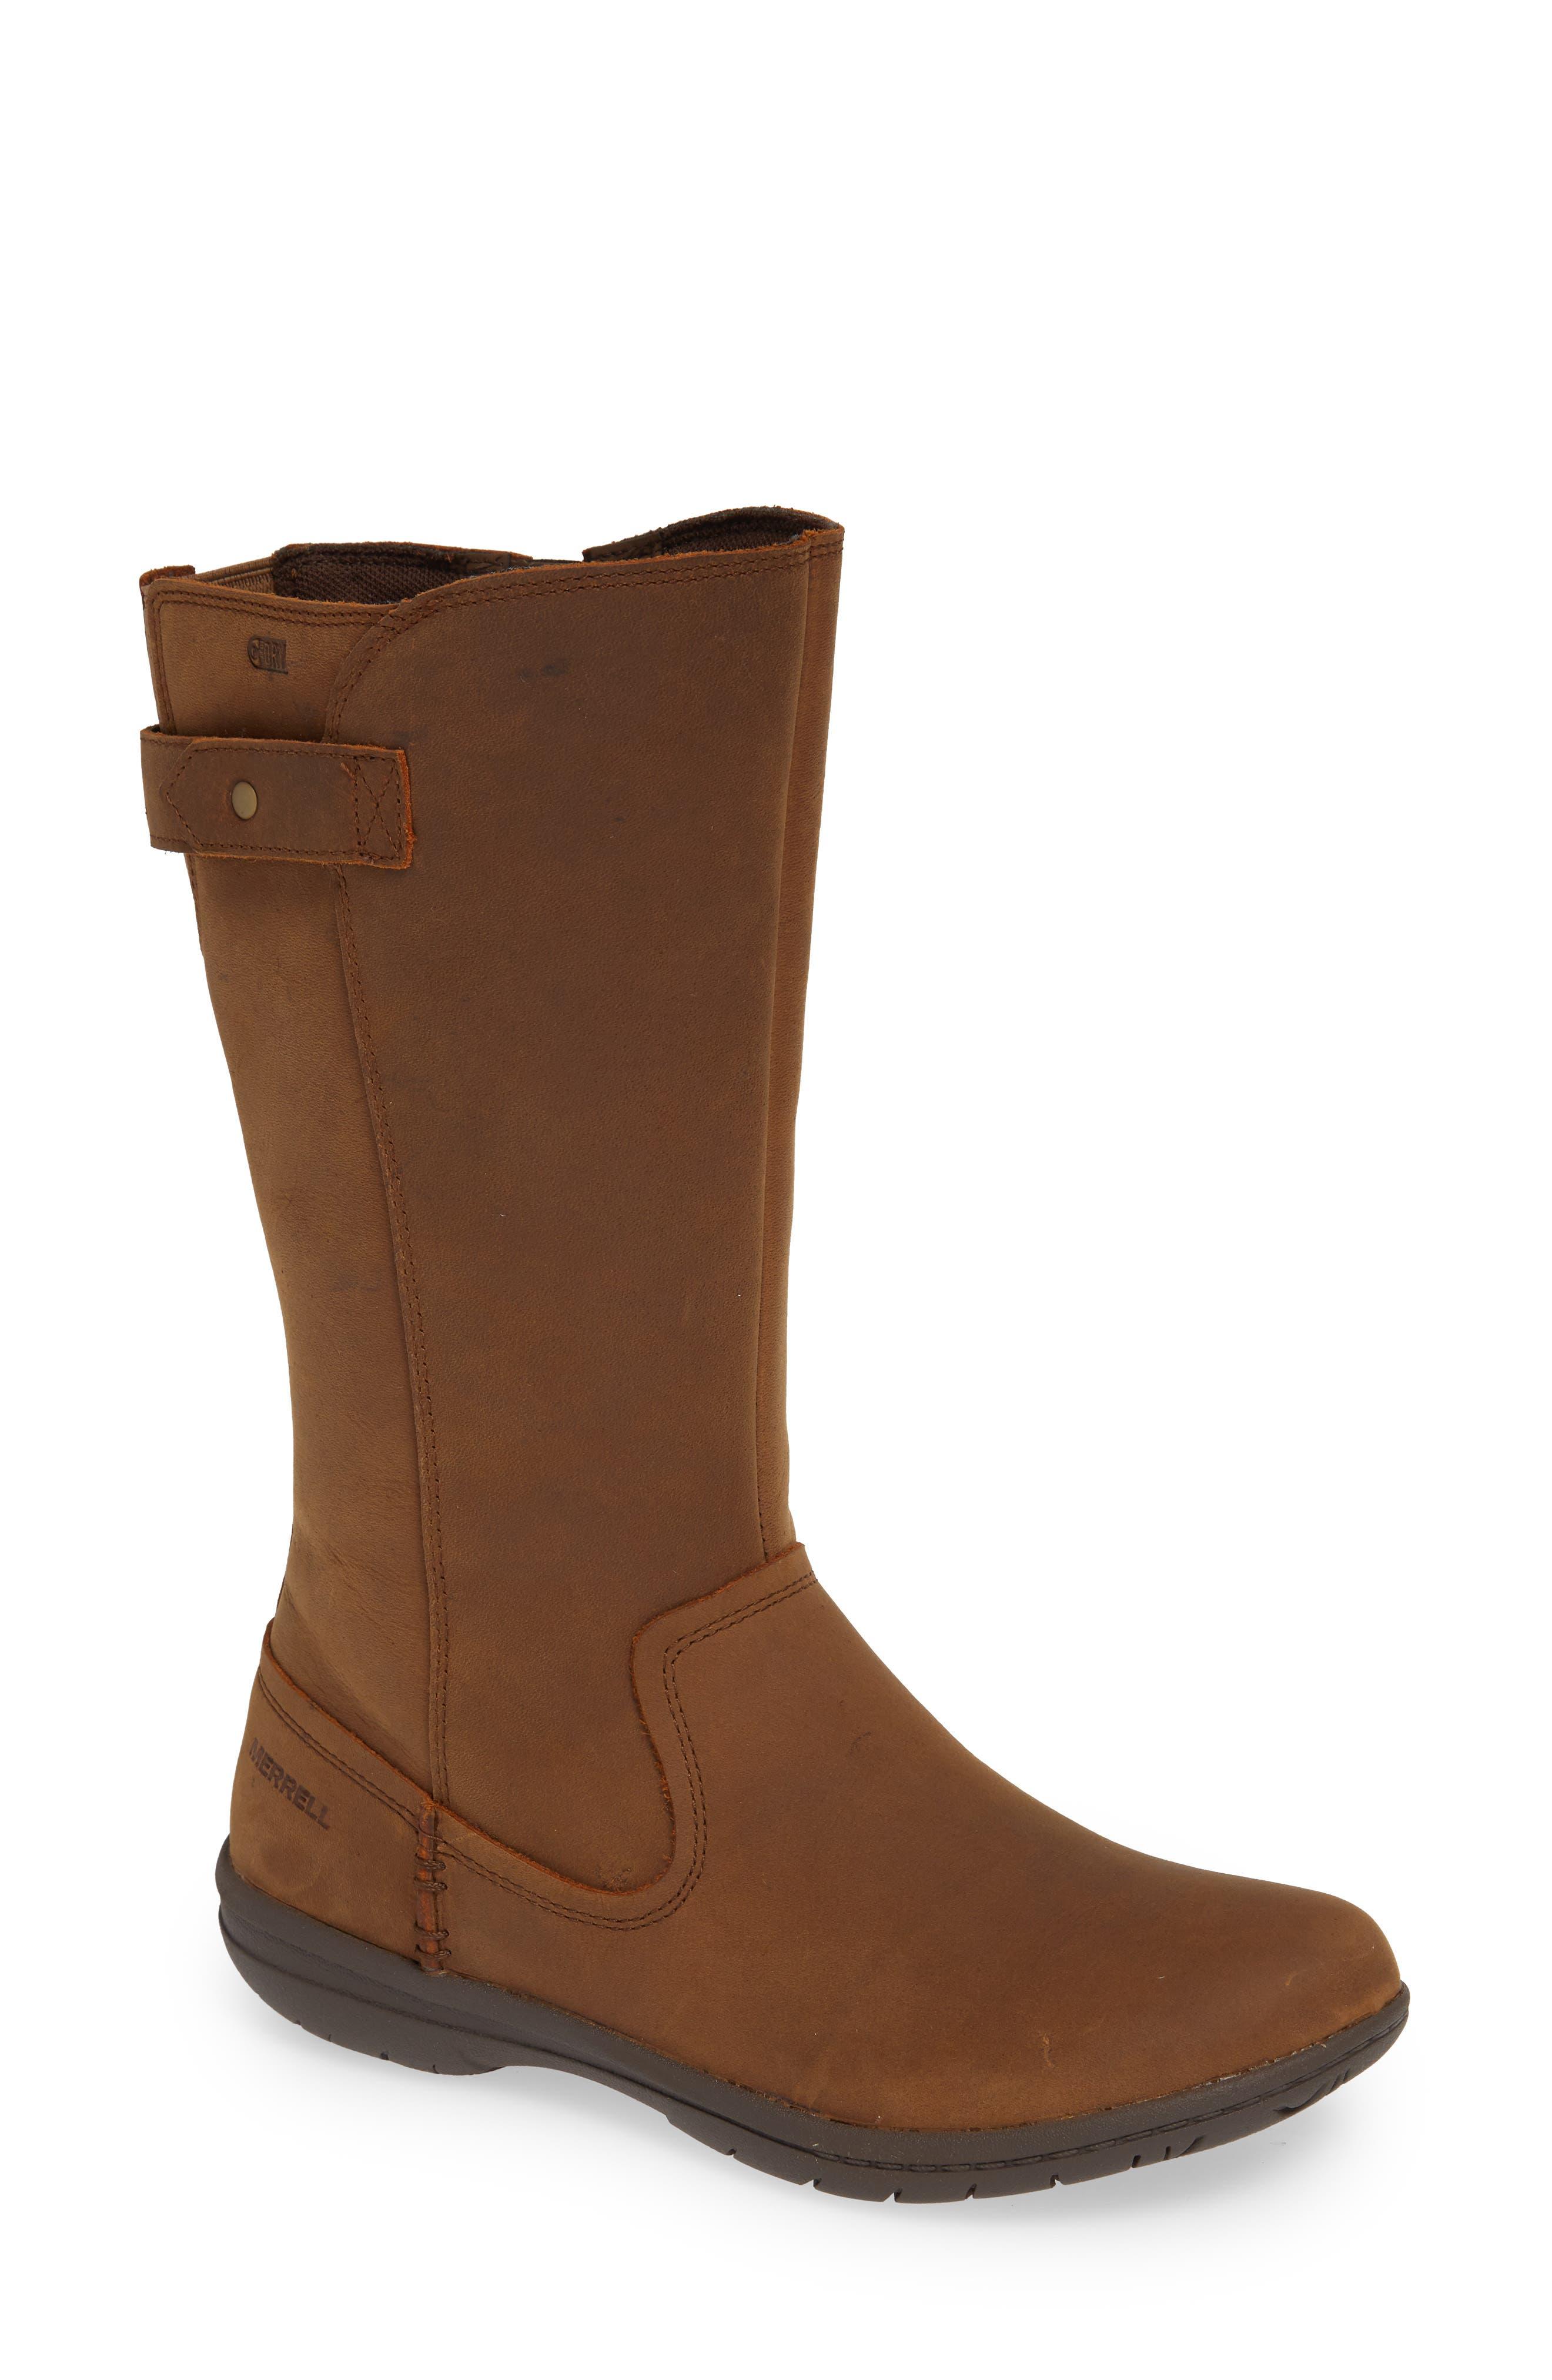 Merrell Encore Kassie Waterproof Boot, Beige